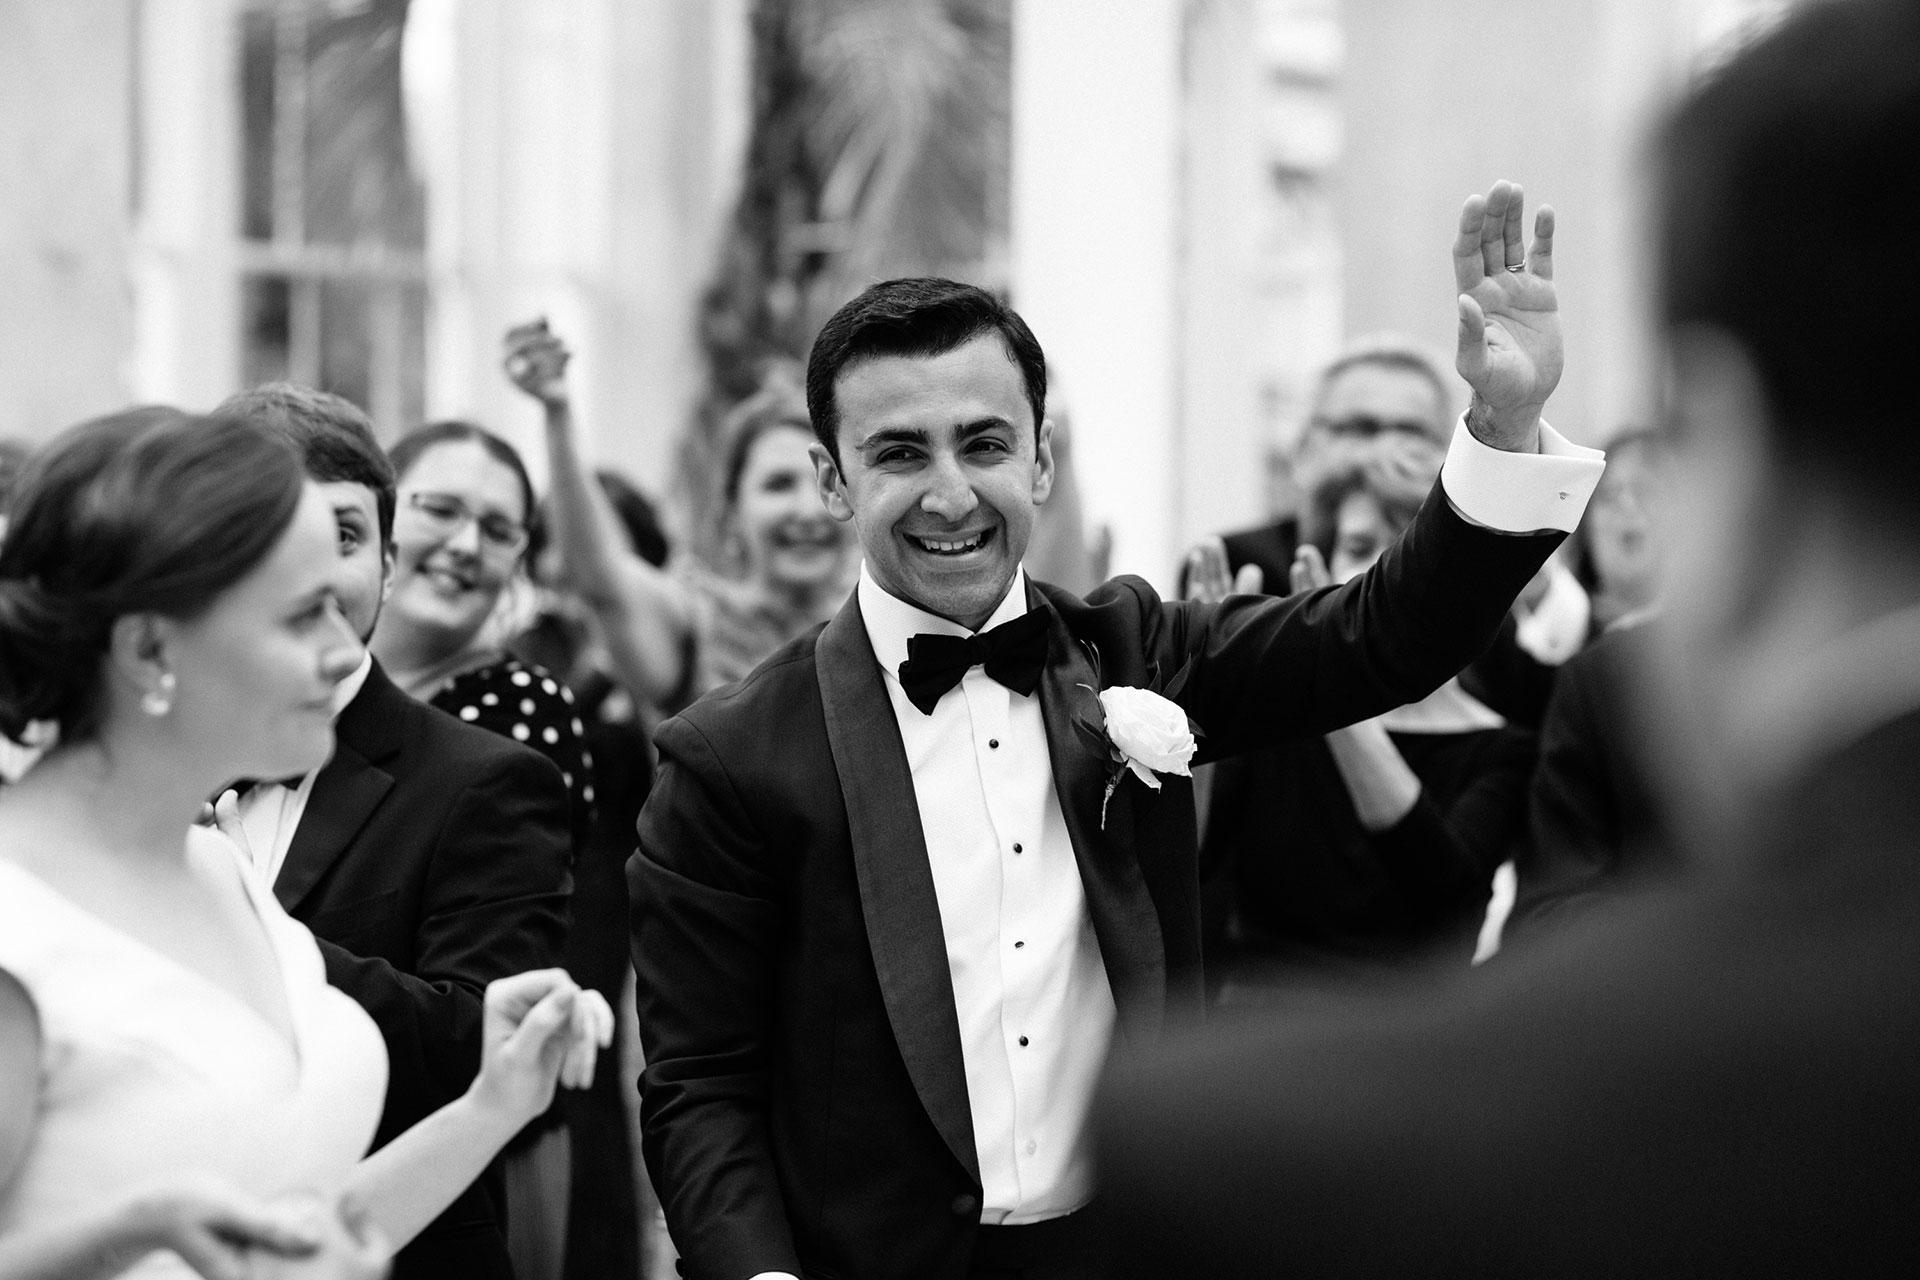 Syon-Park-Wedding-Photographer--_-Michael-Newington-Gray-480.jpg